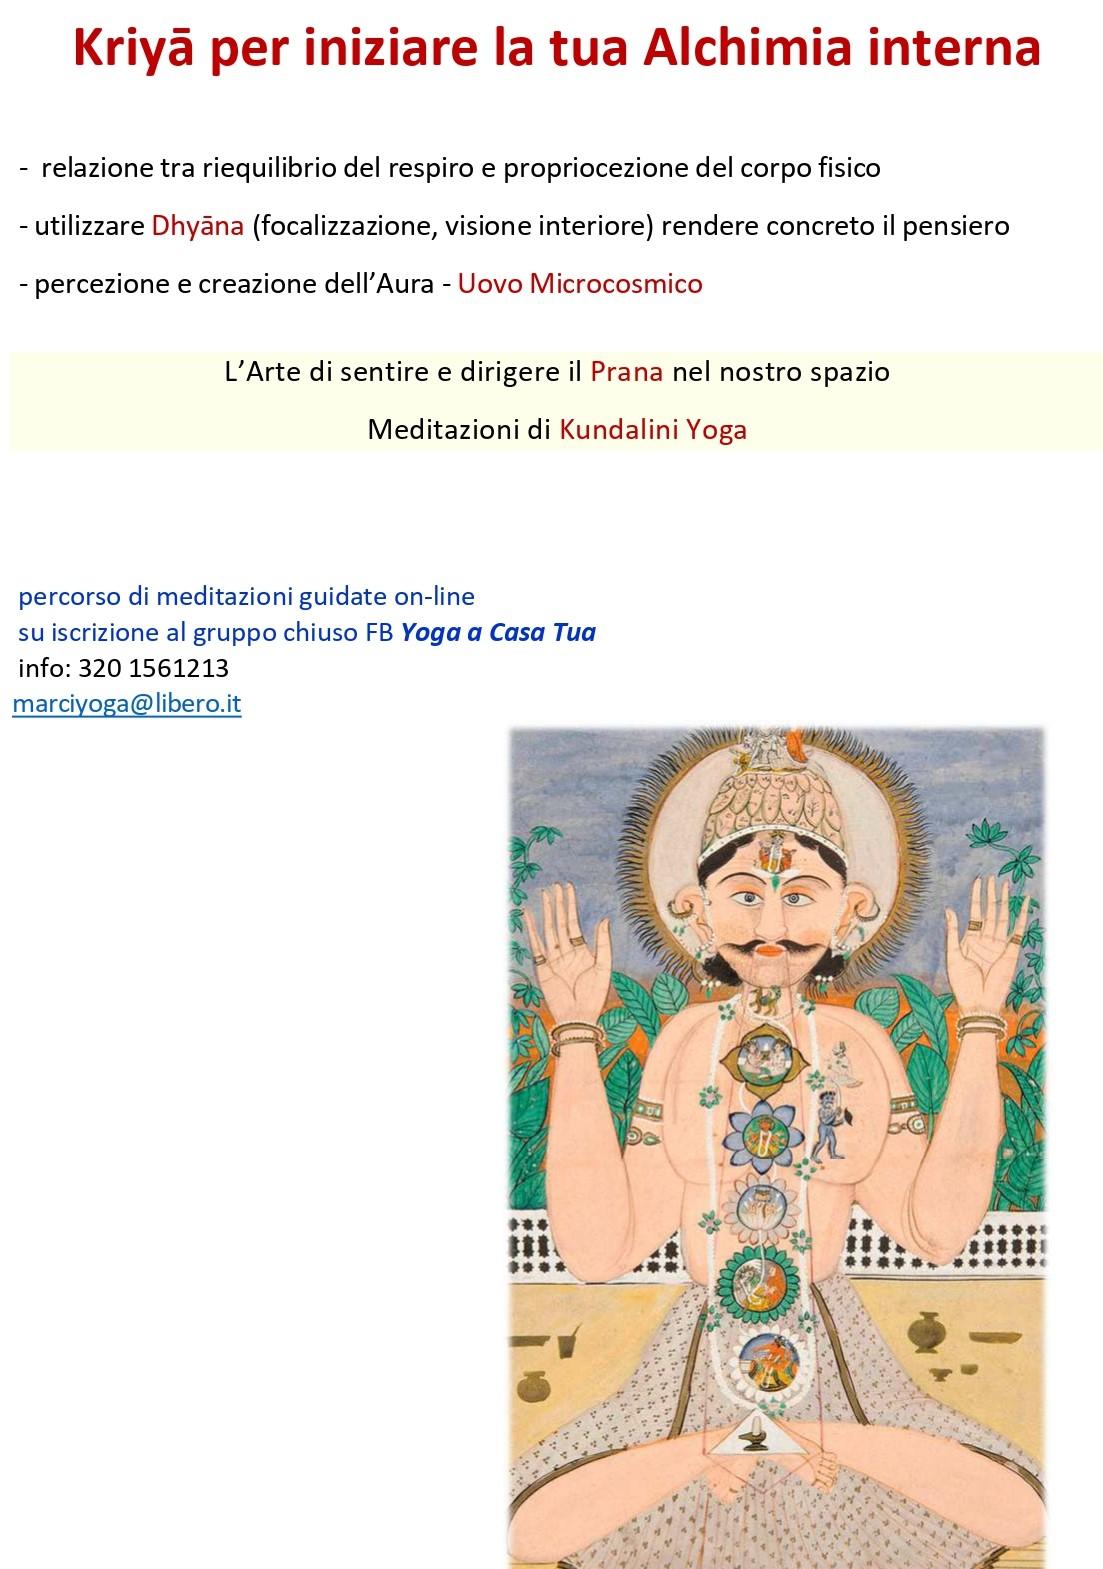 Kriya Alchimia Interna page 0002